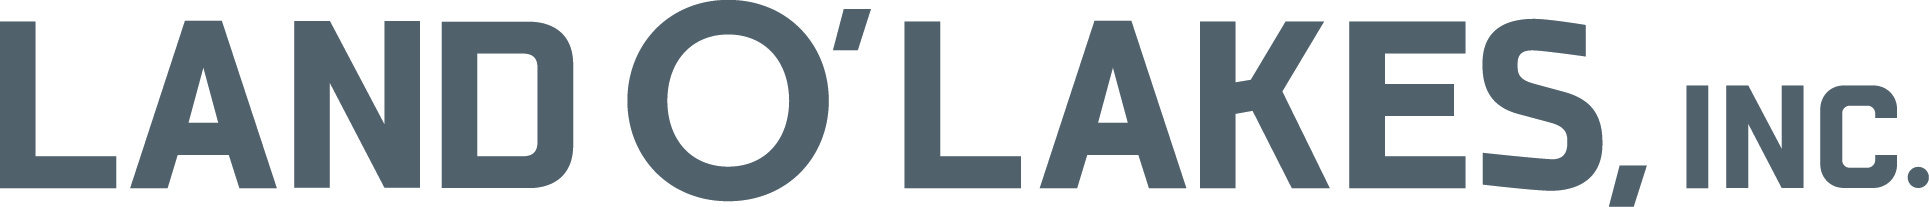 LOL_inc_logo_type-cool-gray10 (002).jpg